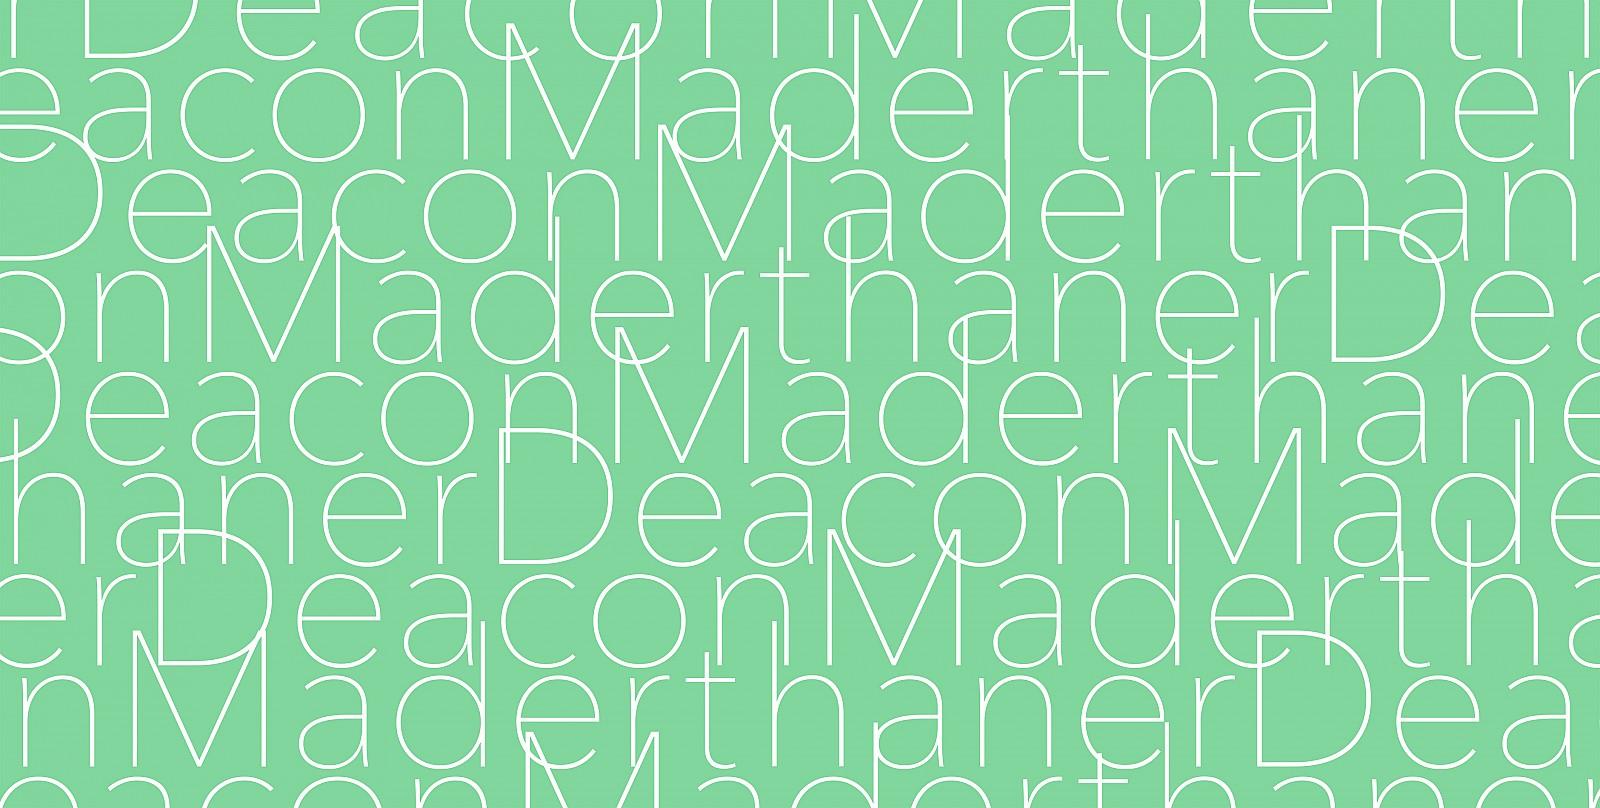 Deacon-Maderthaner